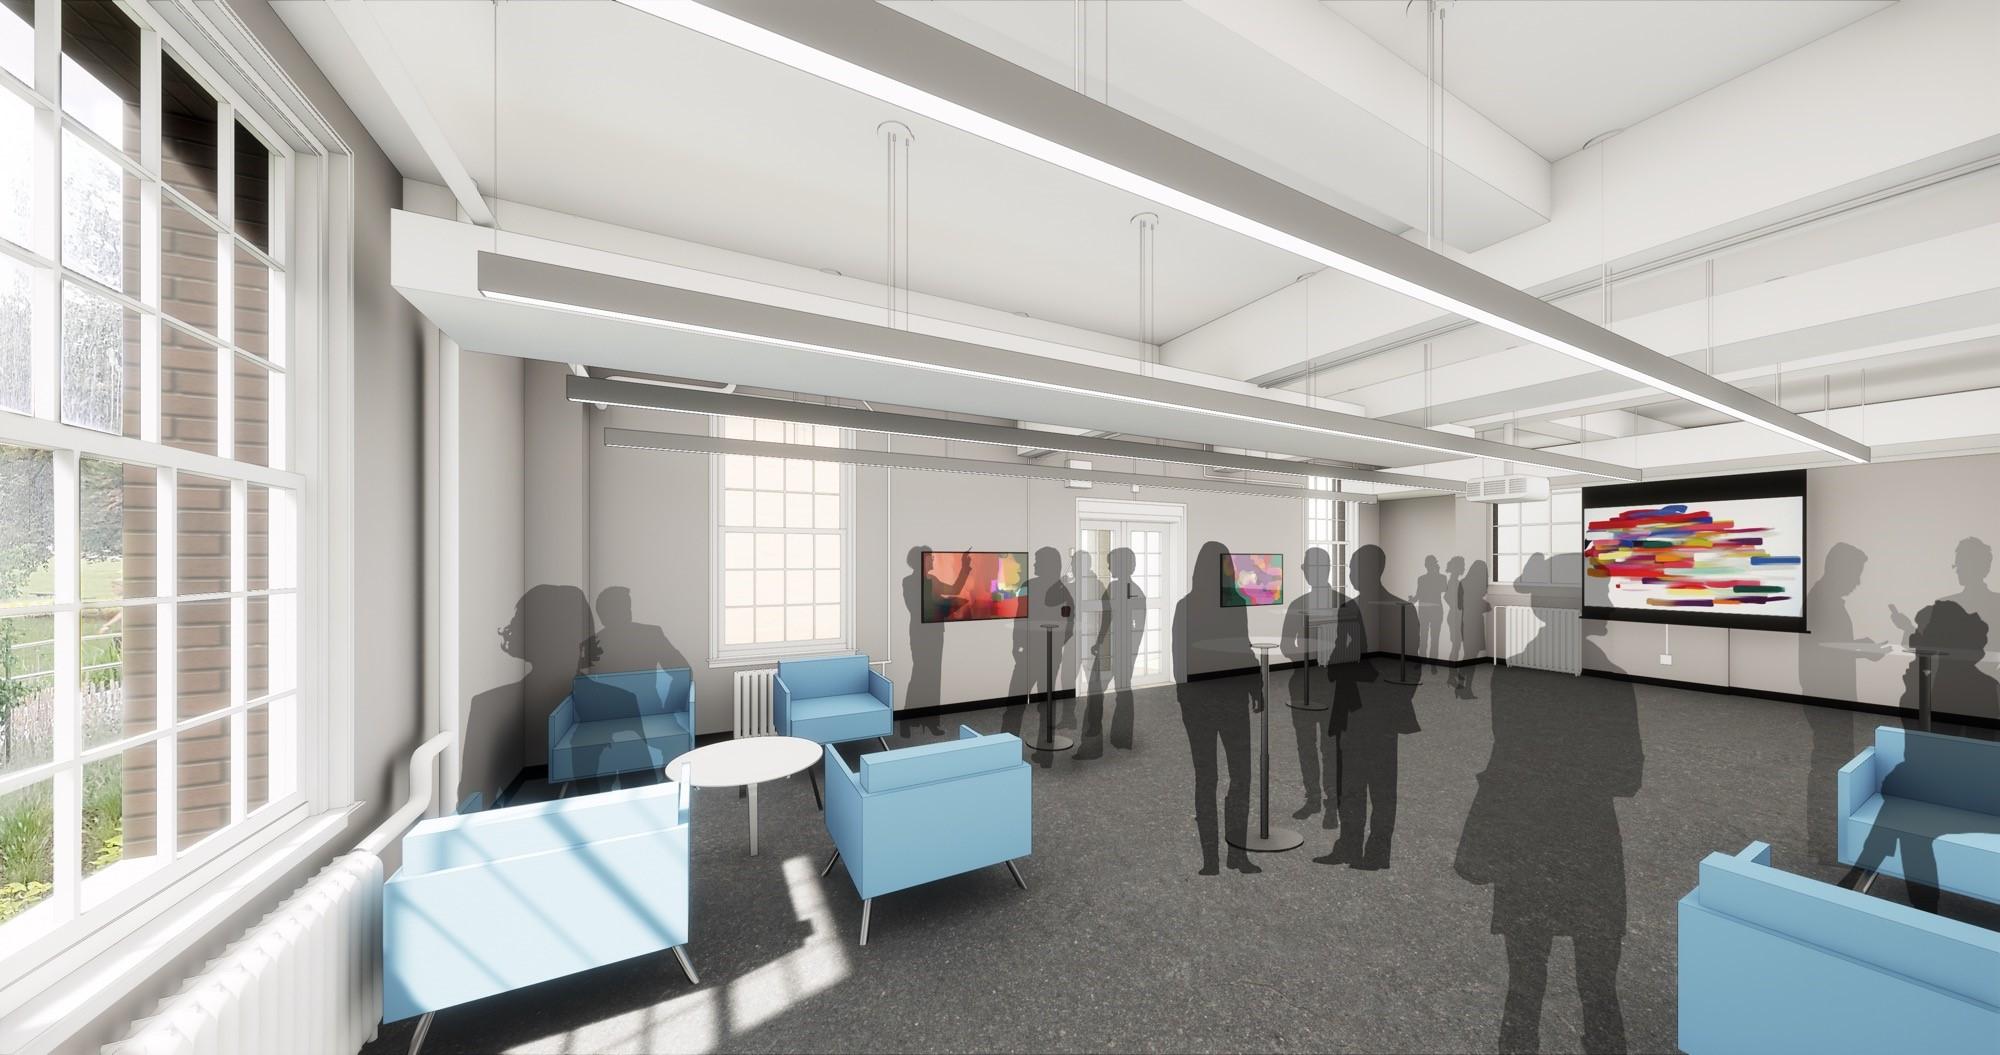 Rendering of renovated space